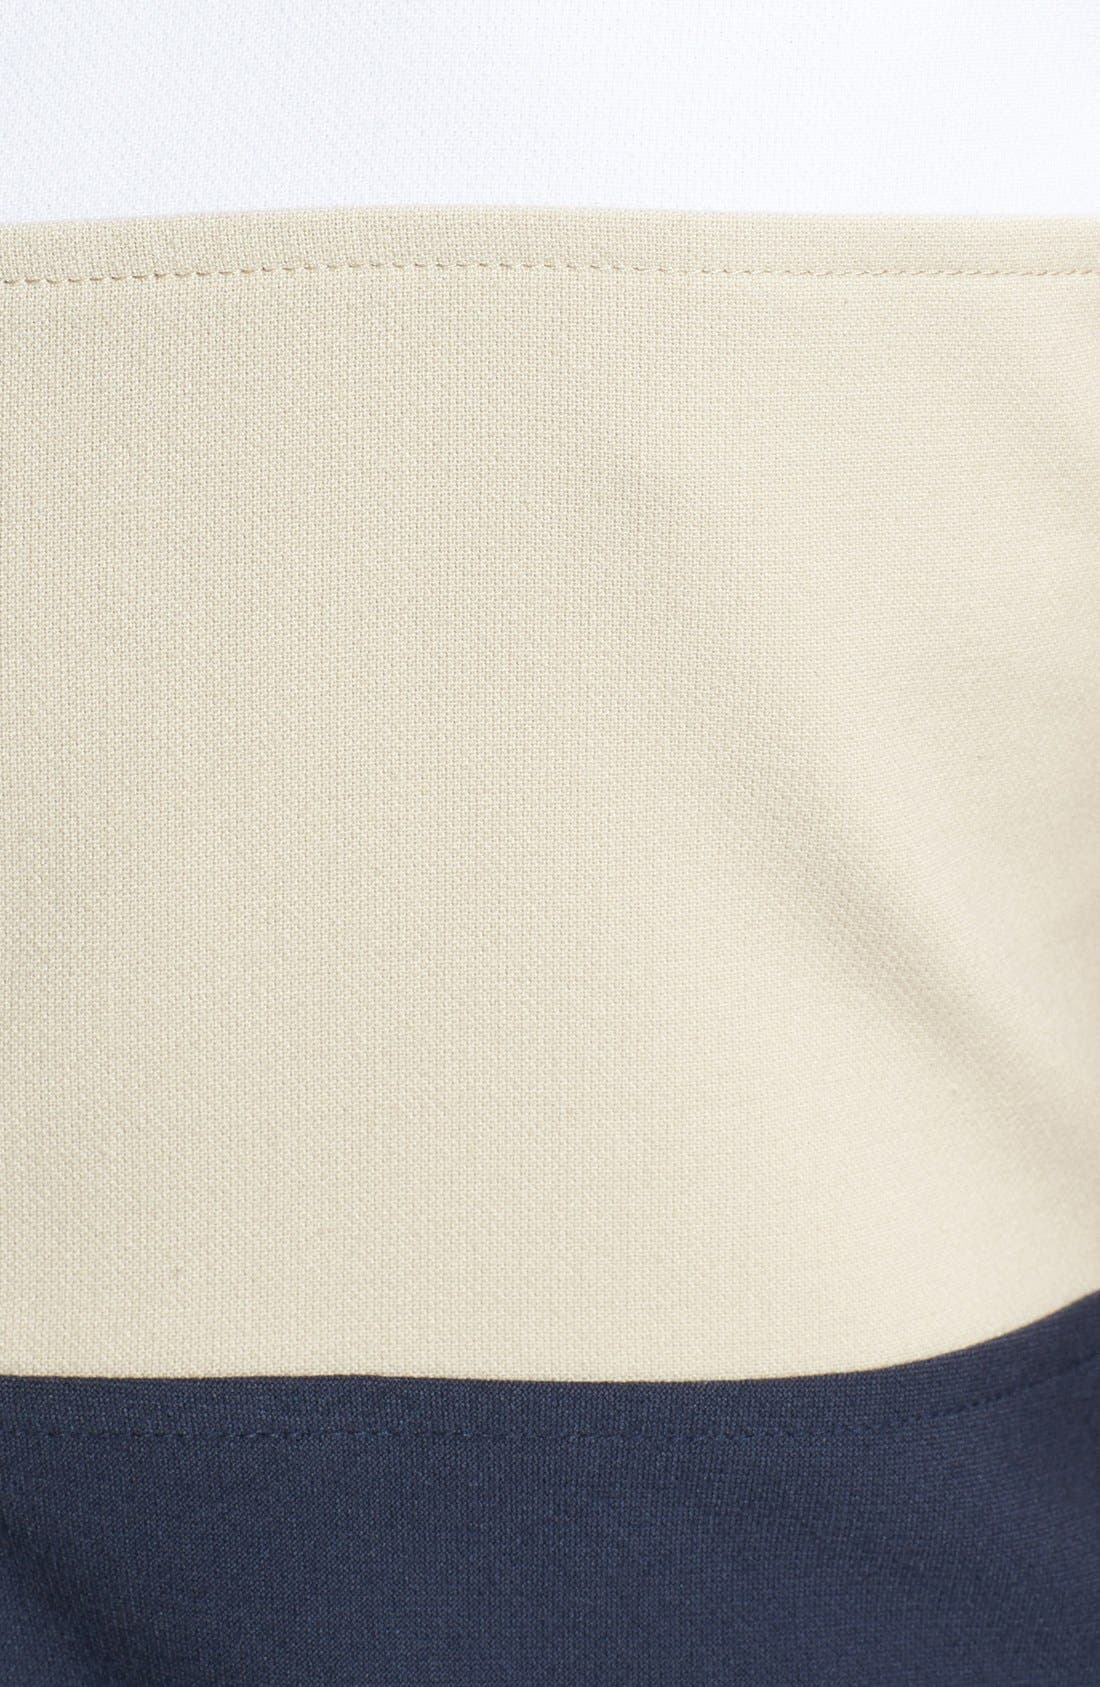 Alternate Image 3  - MICHAEL Michael Kors Colorblock Fit & Flare Dress (Regular & Petite)